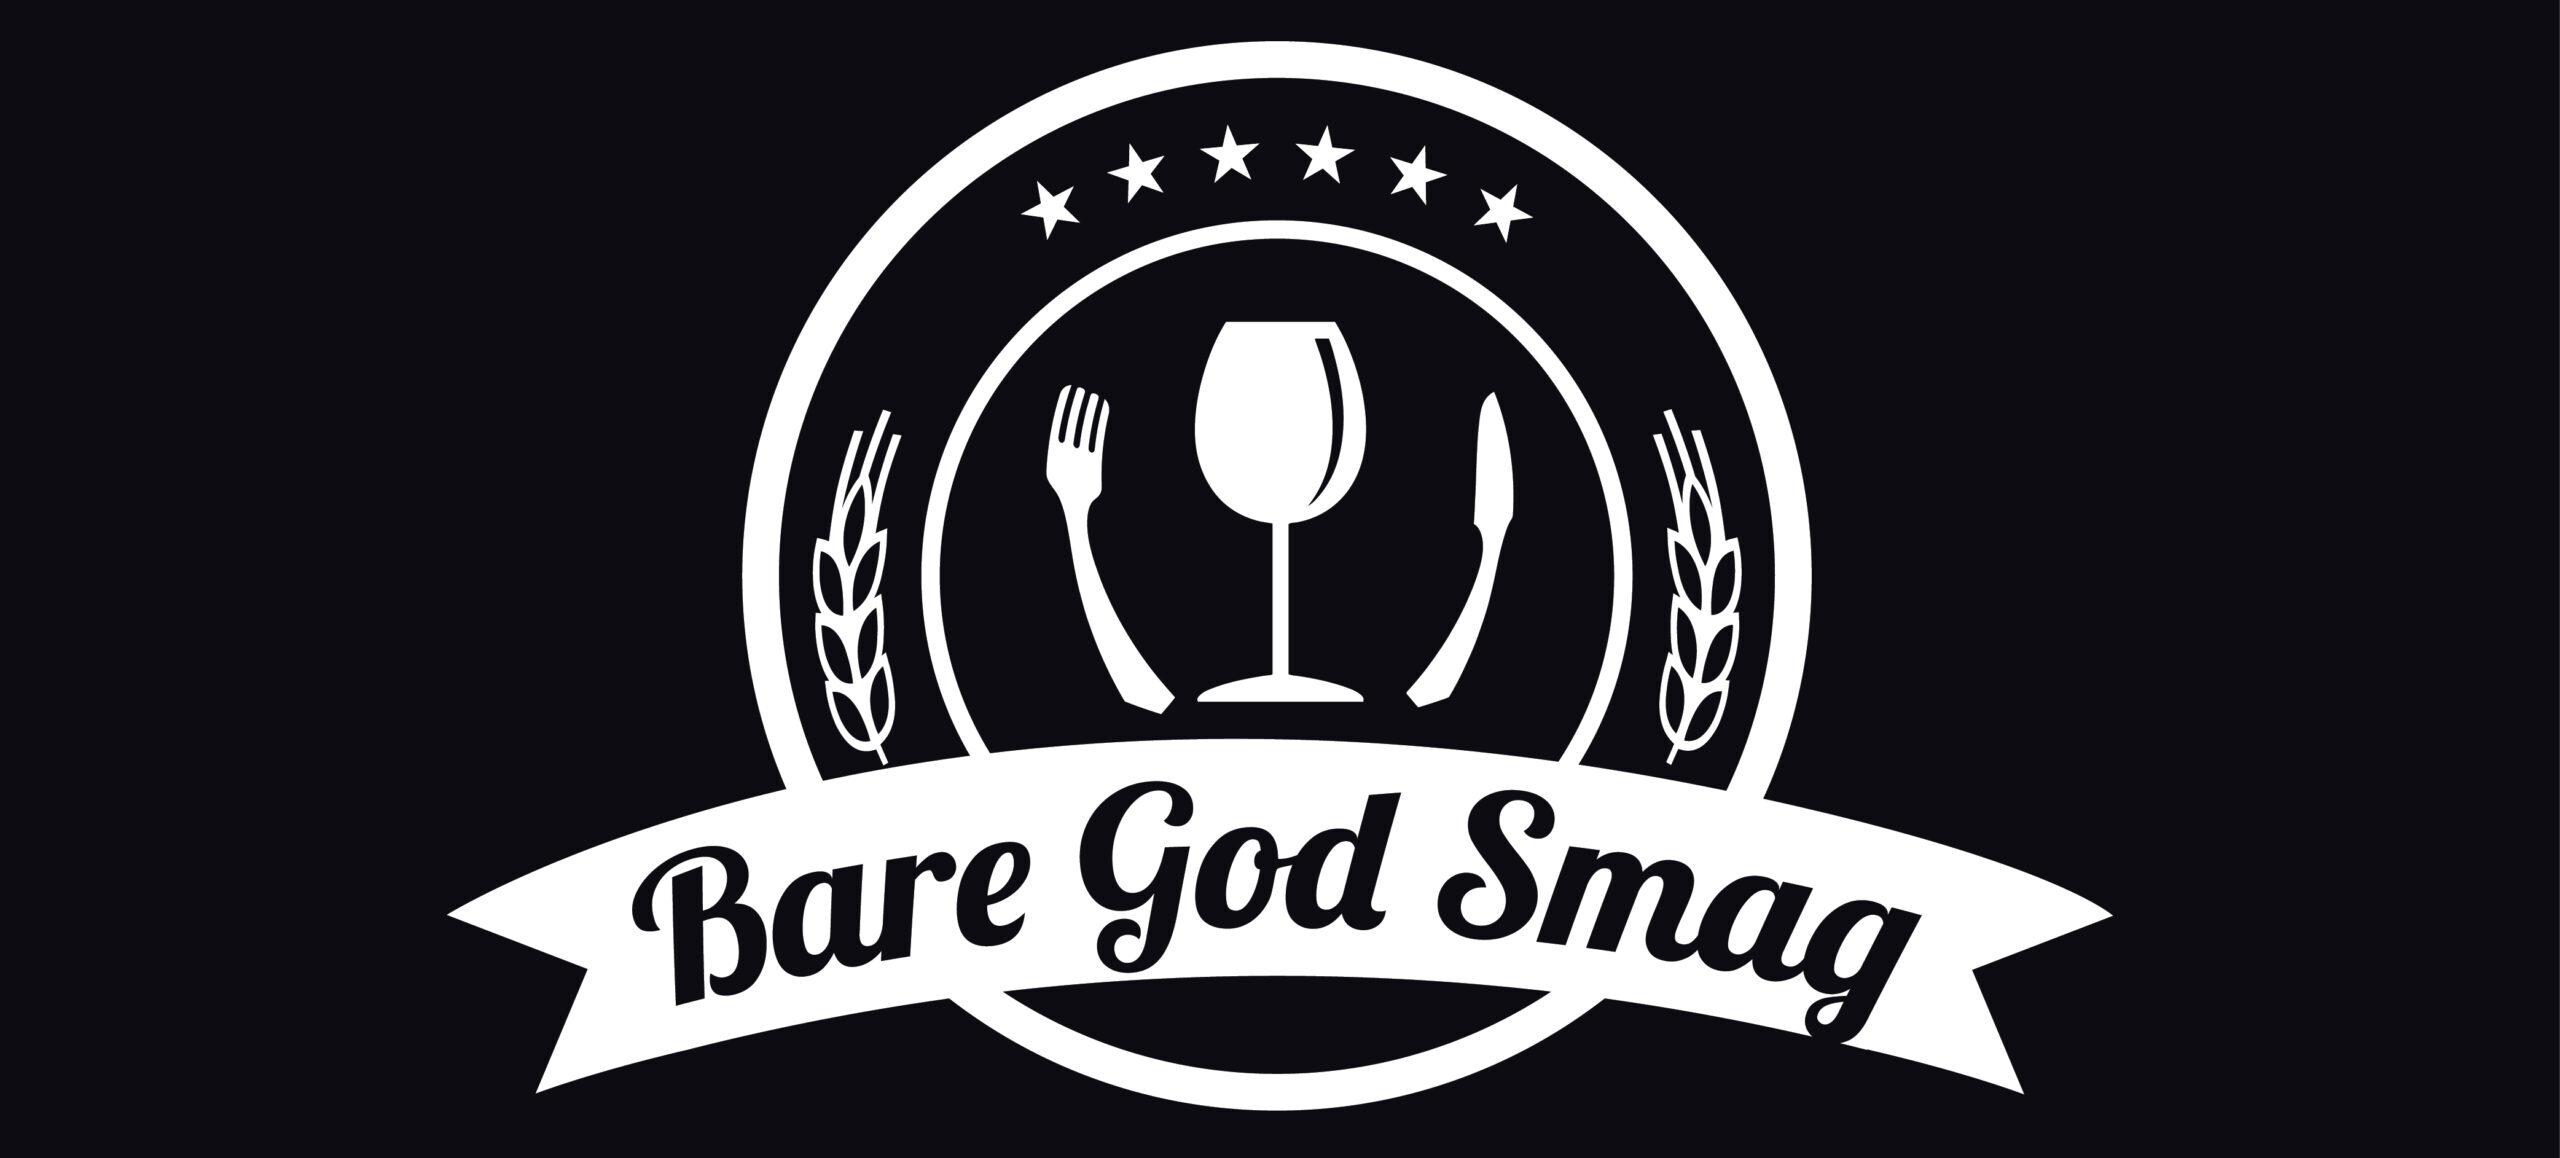 Bare God Smag